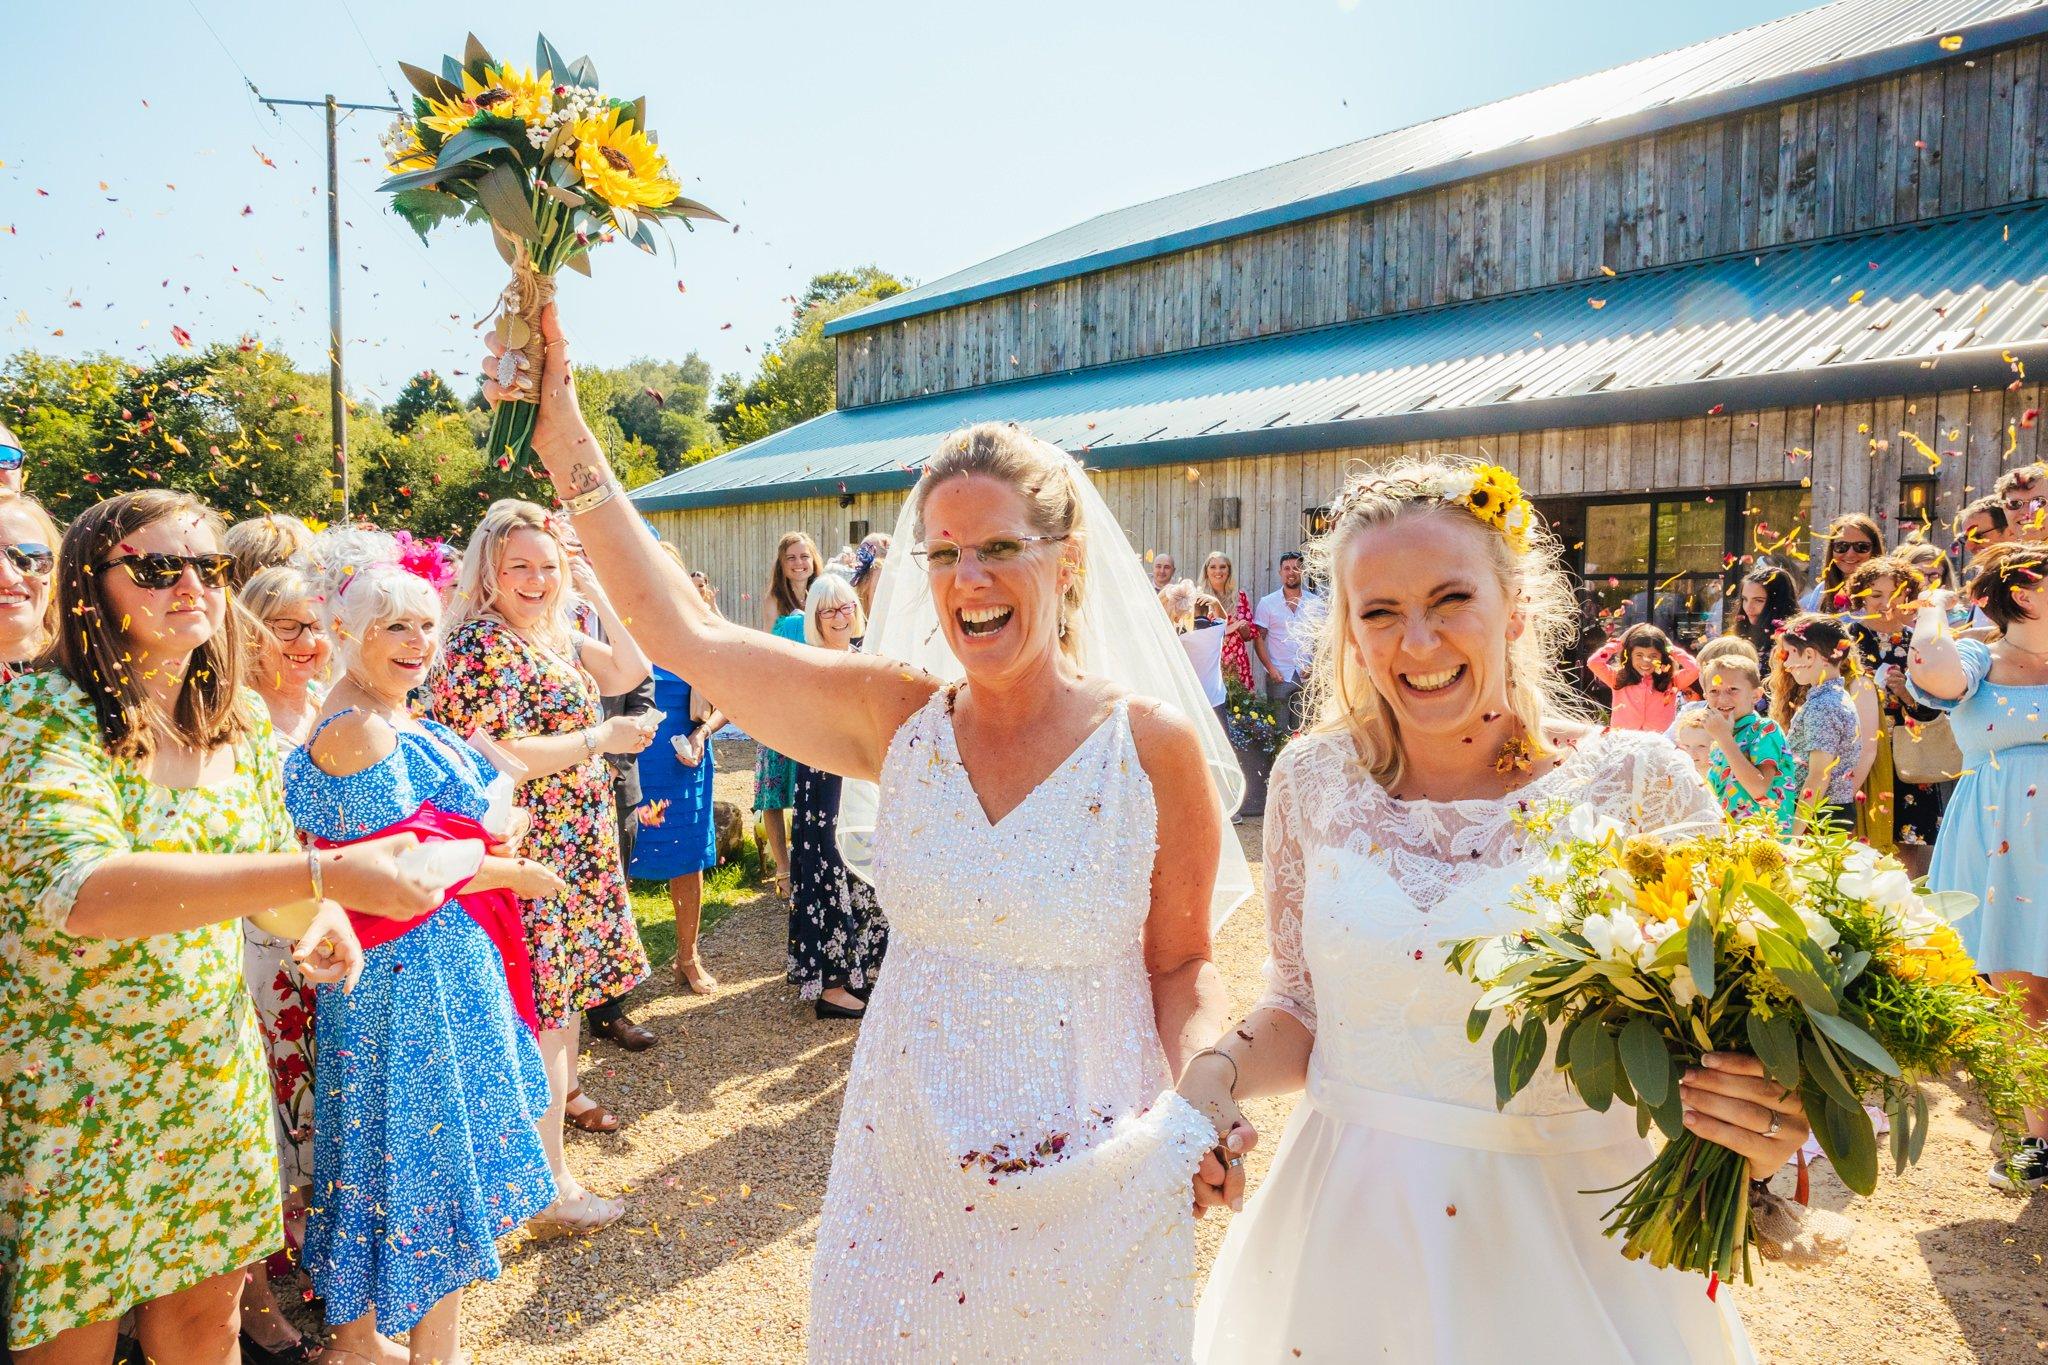 Wedding Photography Nottingham - Brides walking through confetti tunnel on bright sunny day